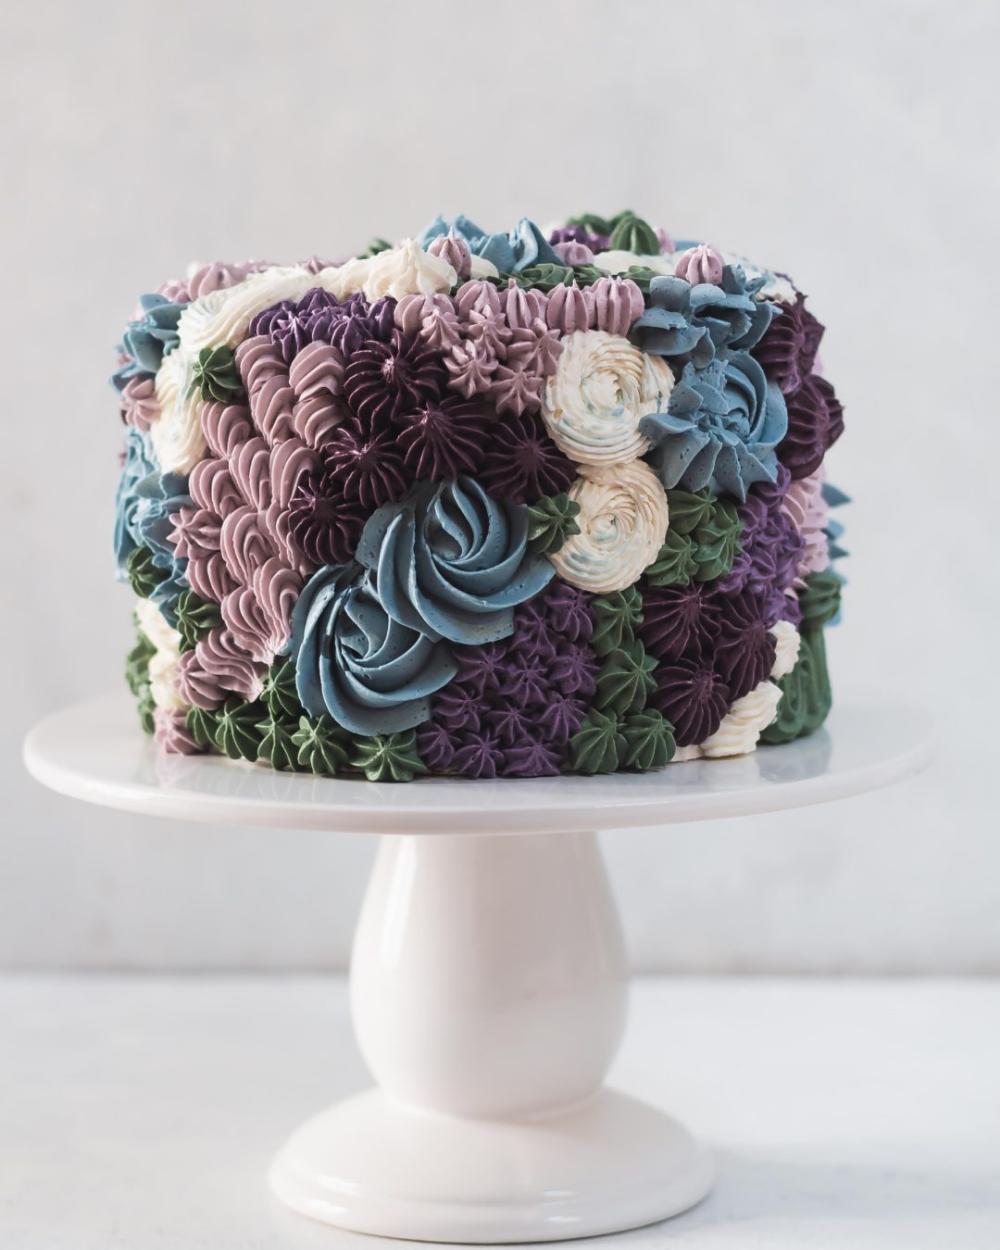 Star Tip Cake Decorating Fall cakes decorating, Cake